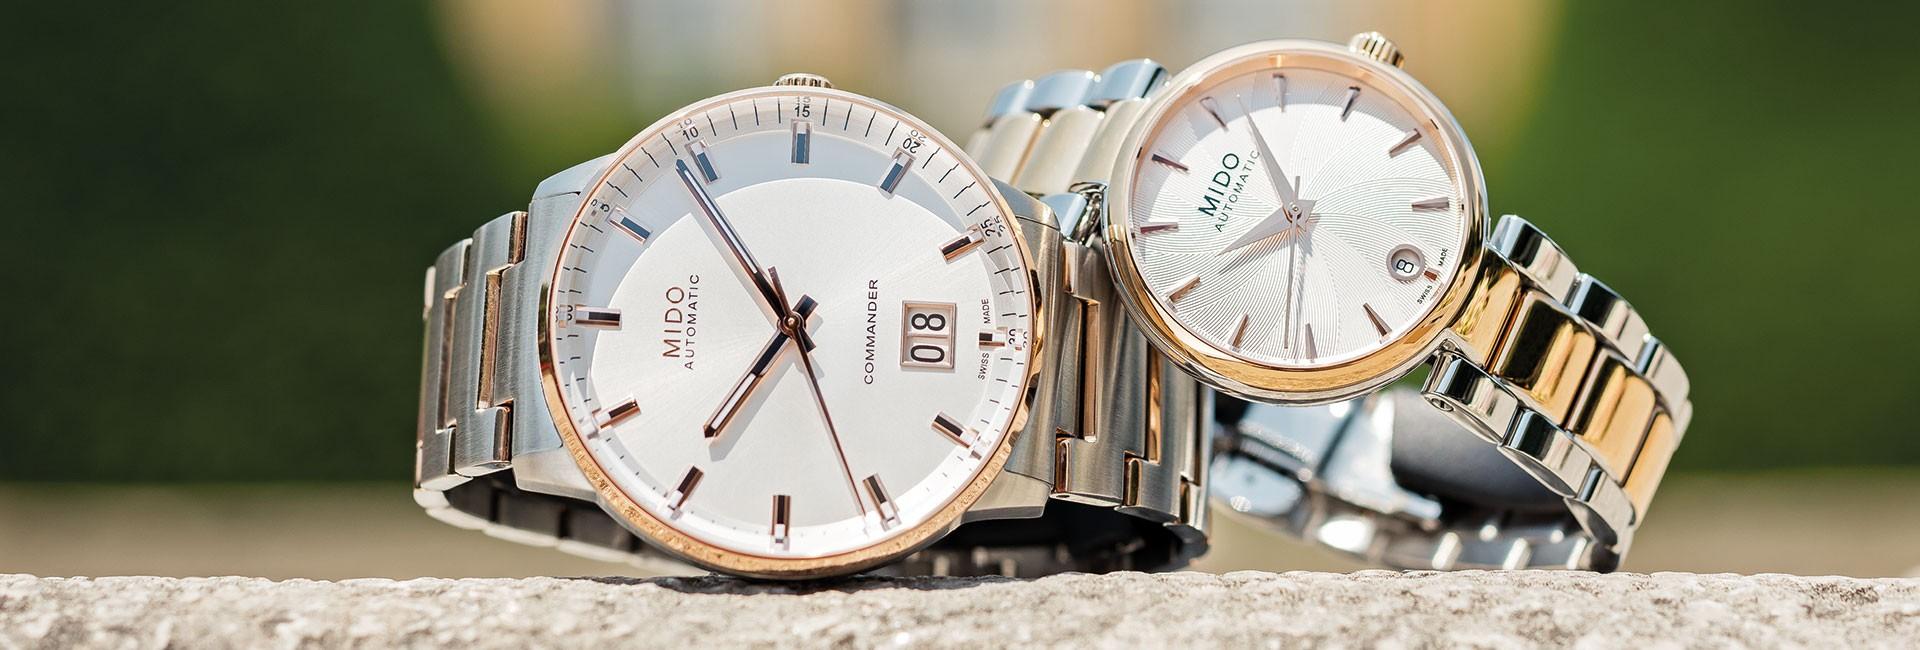 Best selling ladies watches